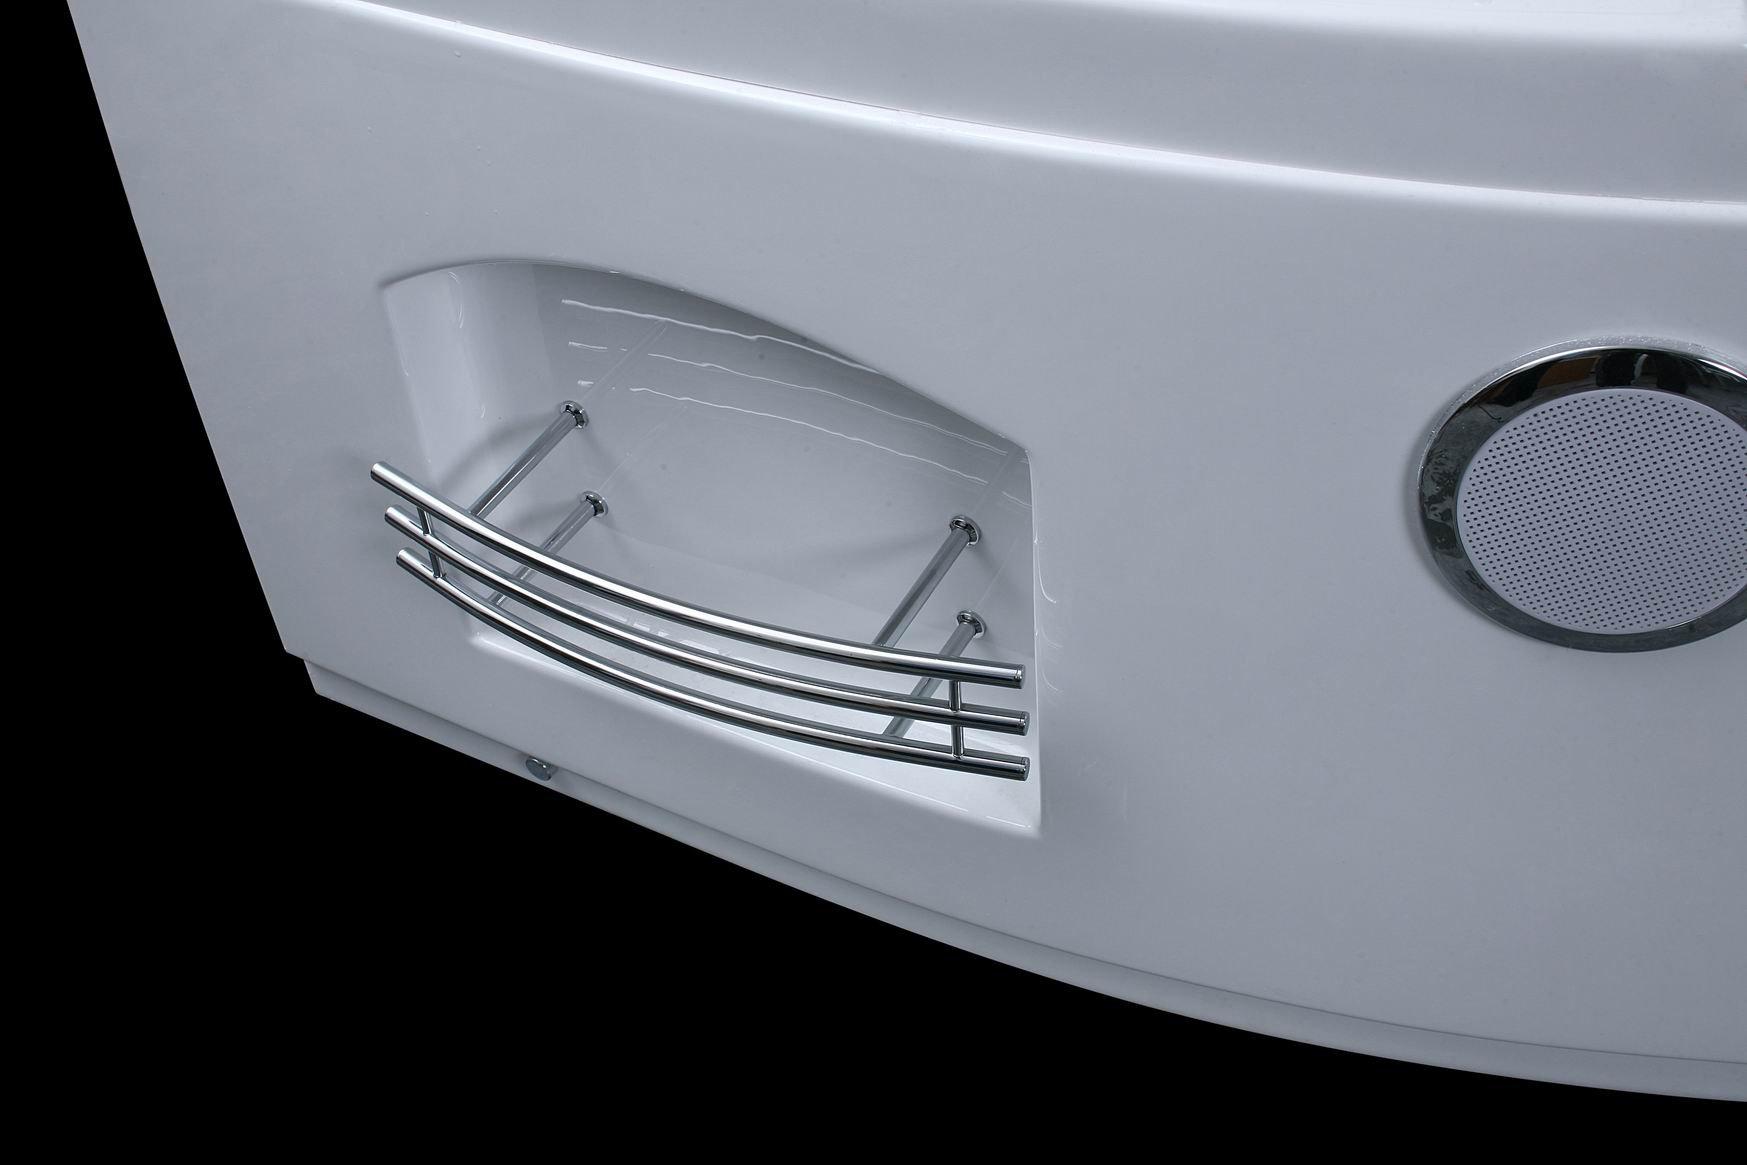 indoor whirlpool hot tubs,portable hot bathtub,corner hot tub best stainless steel dog bathtub